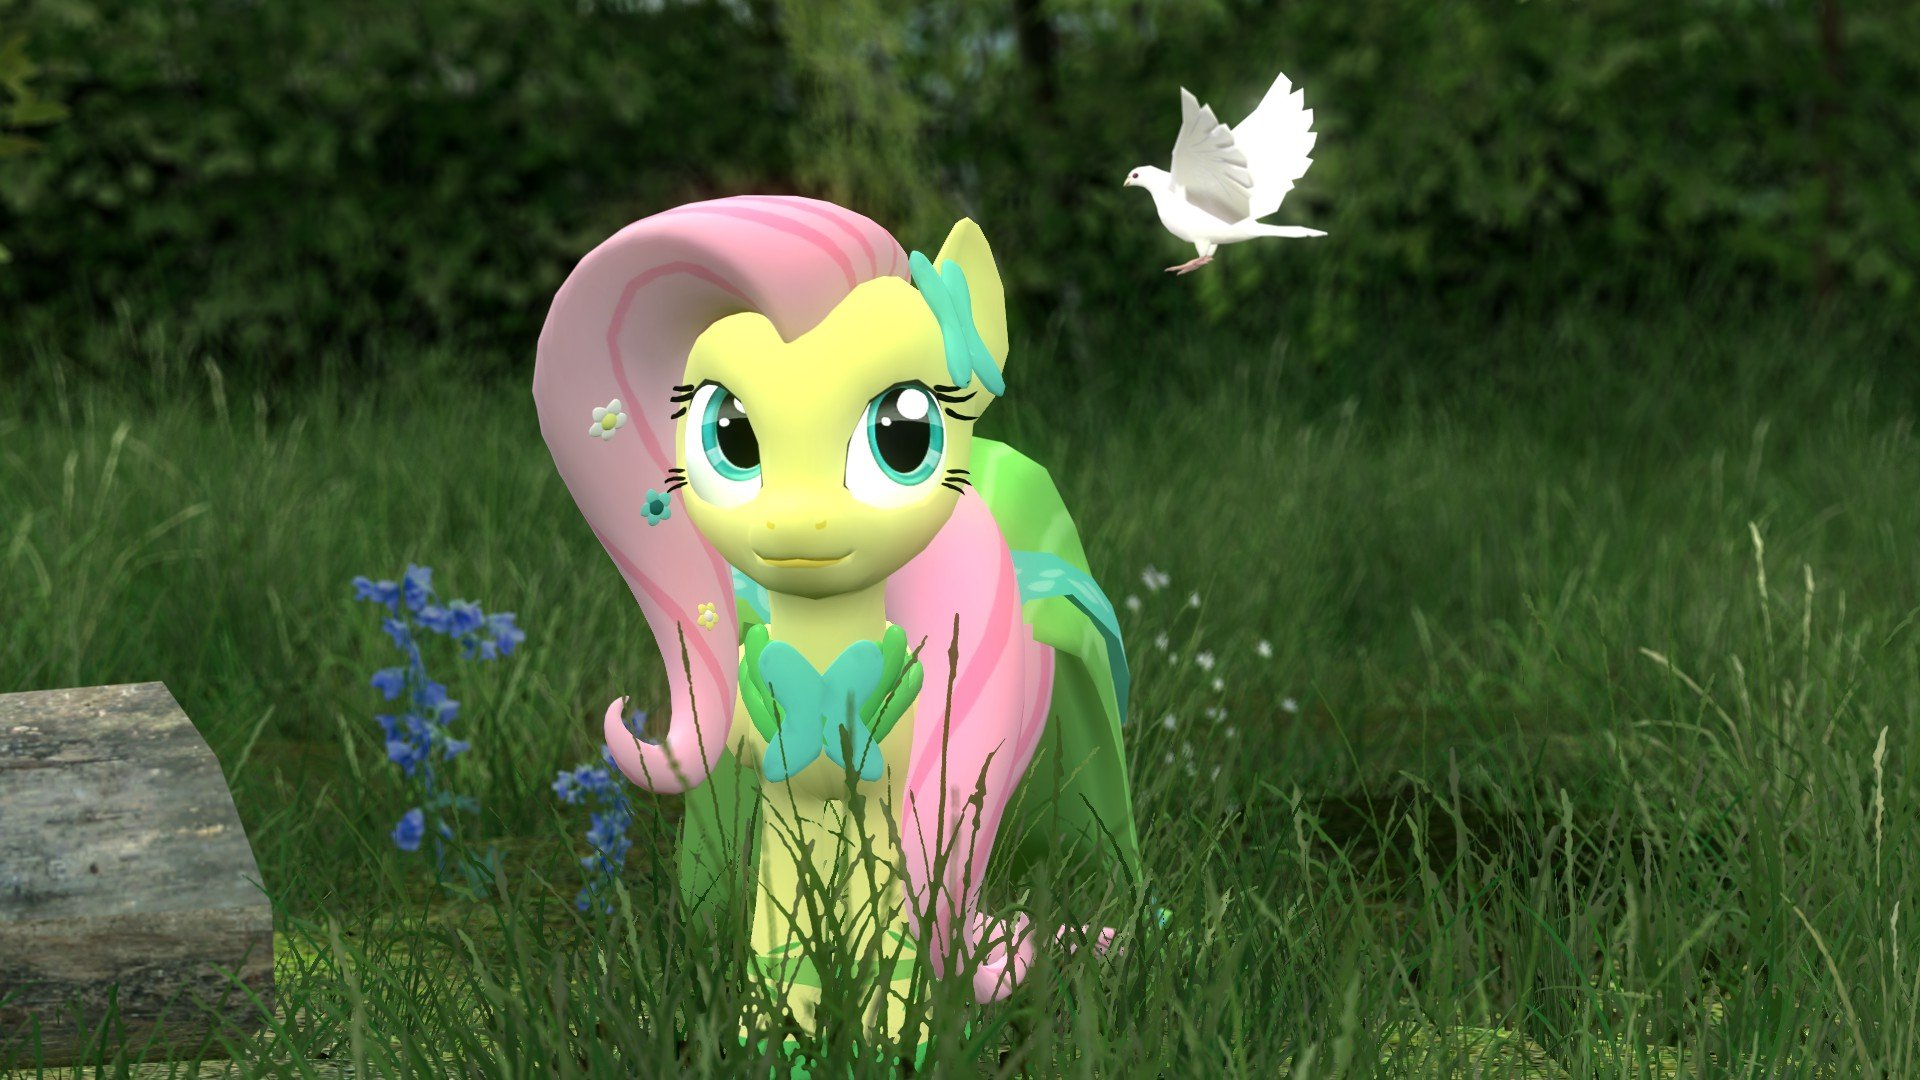 Fluttershy by PontusKay